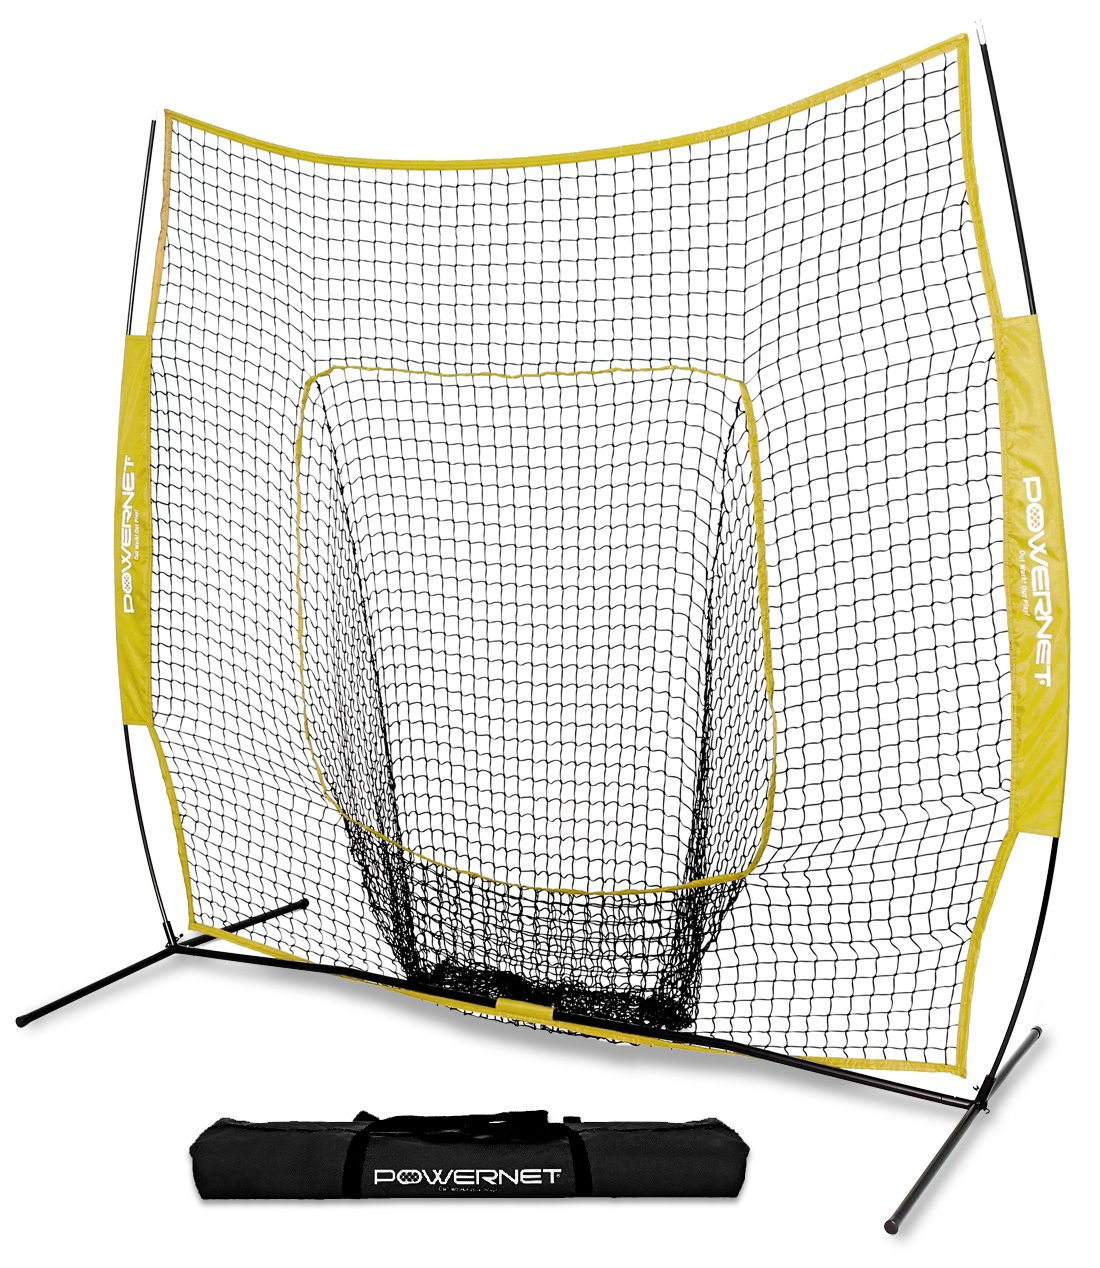 PowerNet Team Color Baseball Softball 7x7 Hitting Net w/Bow Frame (Yellow) by PowerNet